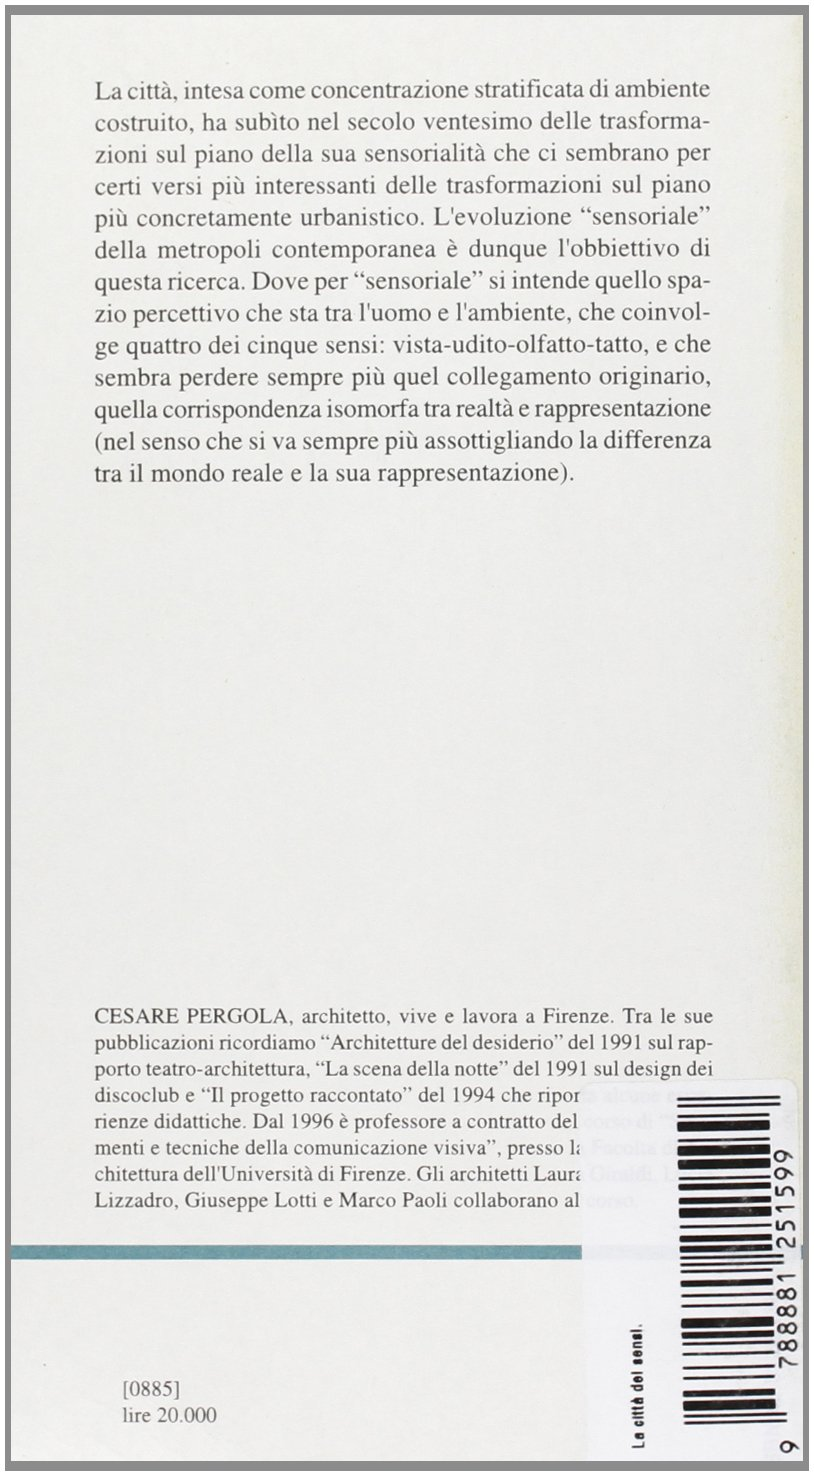 La città dei sensi (Saggi e documenti): Amazon.es: Pergola, Cesare: Libros en idiomas extranjeros